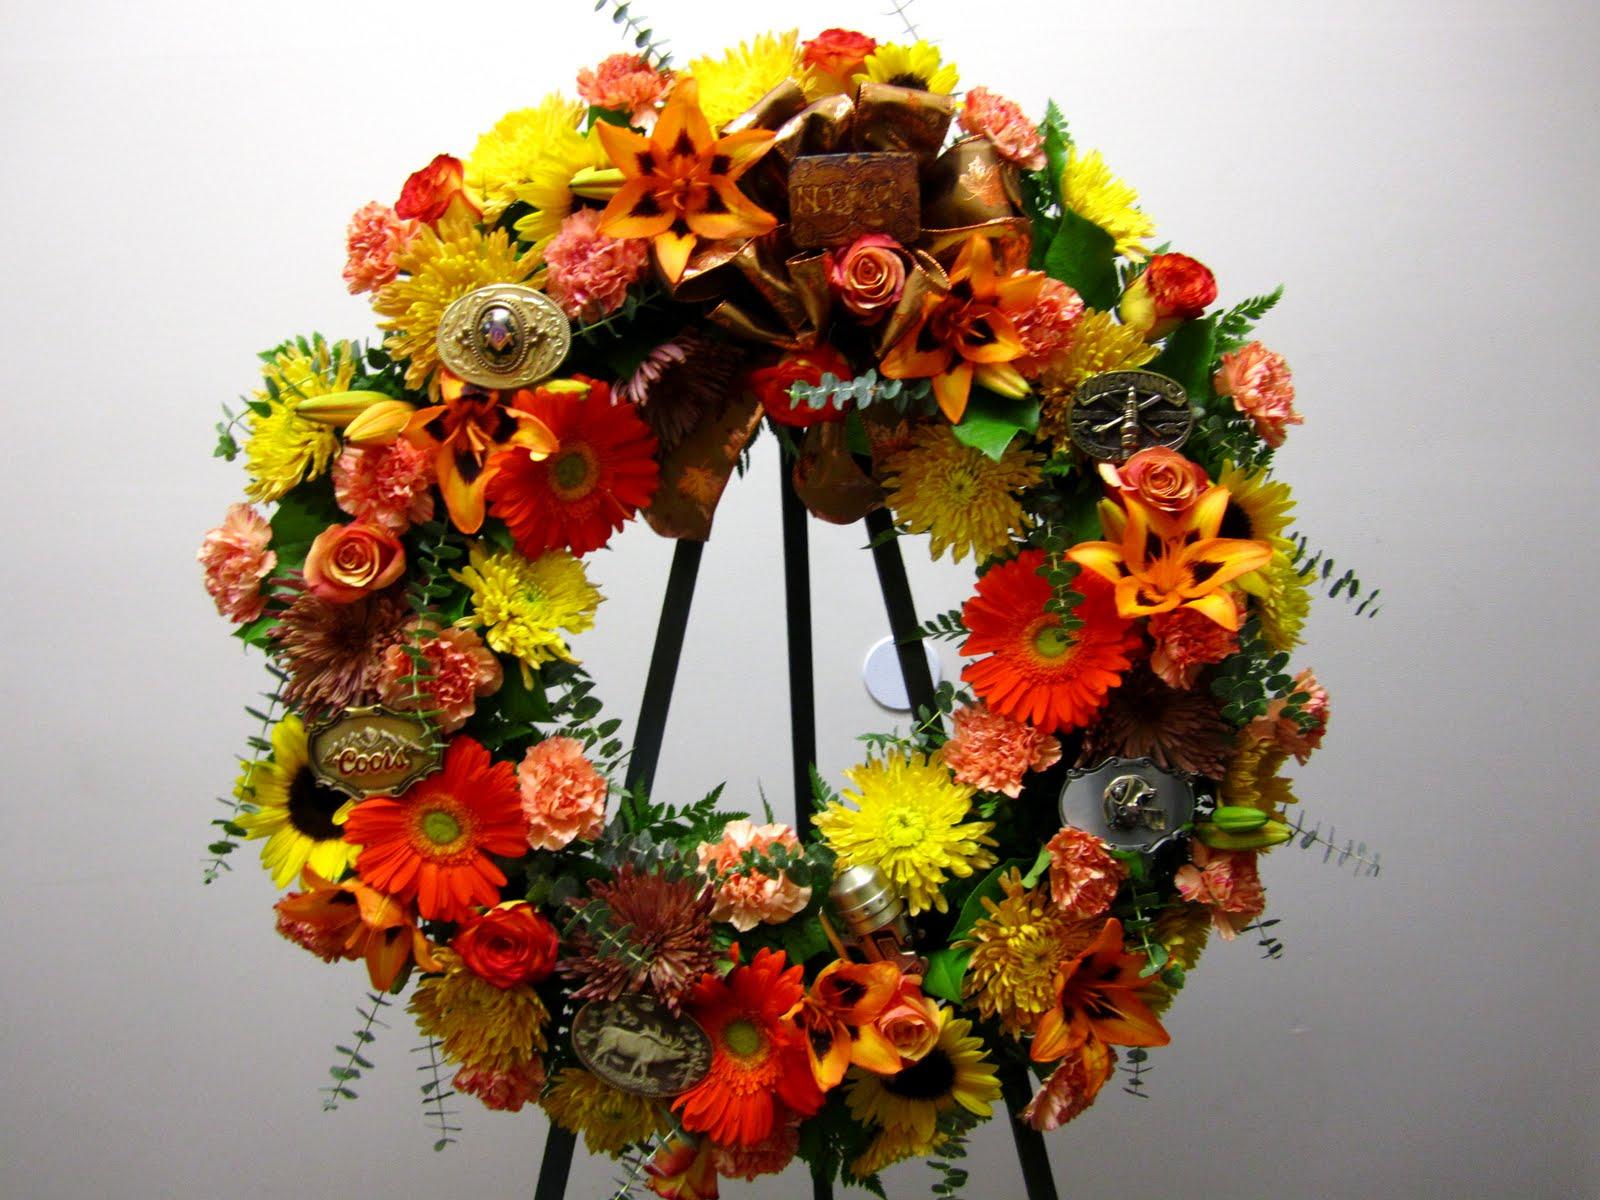 Bernardos flowers custom made wreath custom made wreath izmirmasajfo